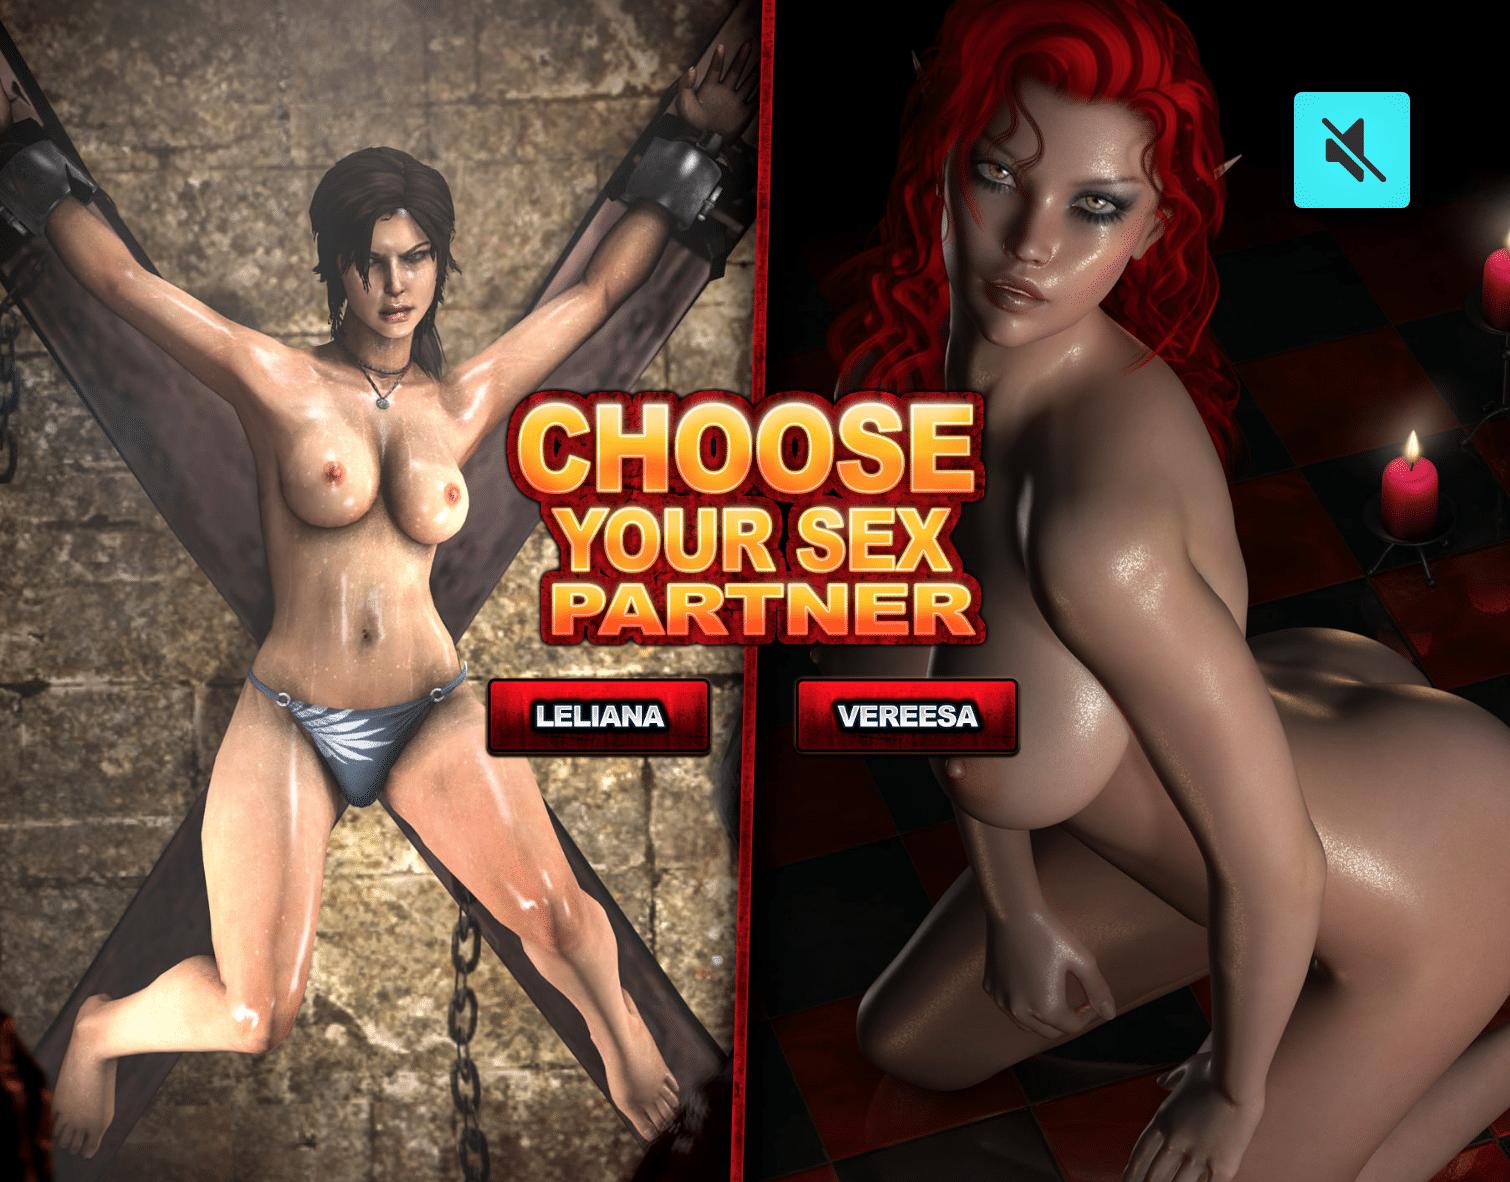 Adult Porn Bdsm free bdsm adult sites . hot naked pics. comments: 2